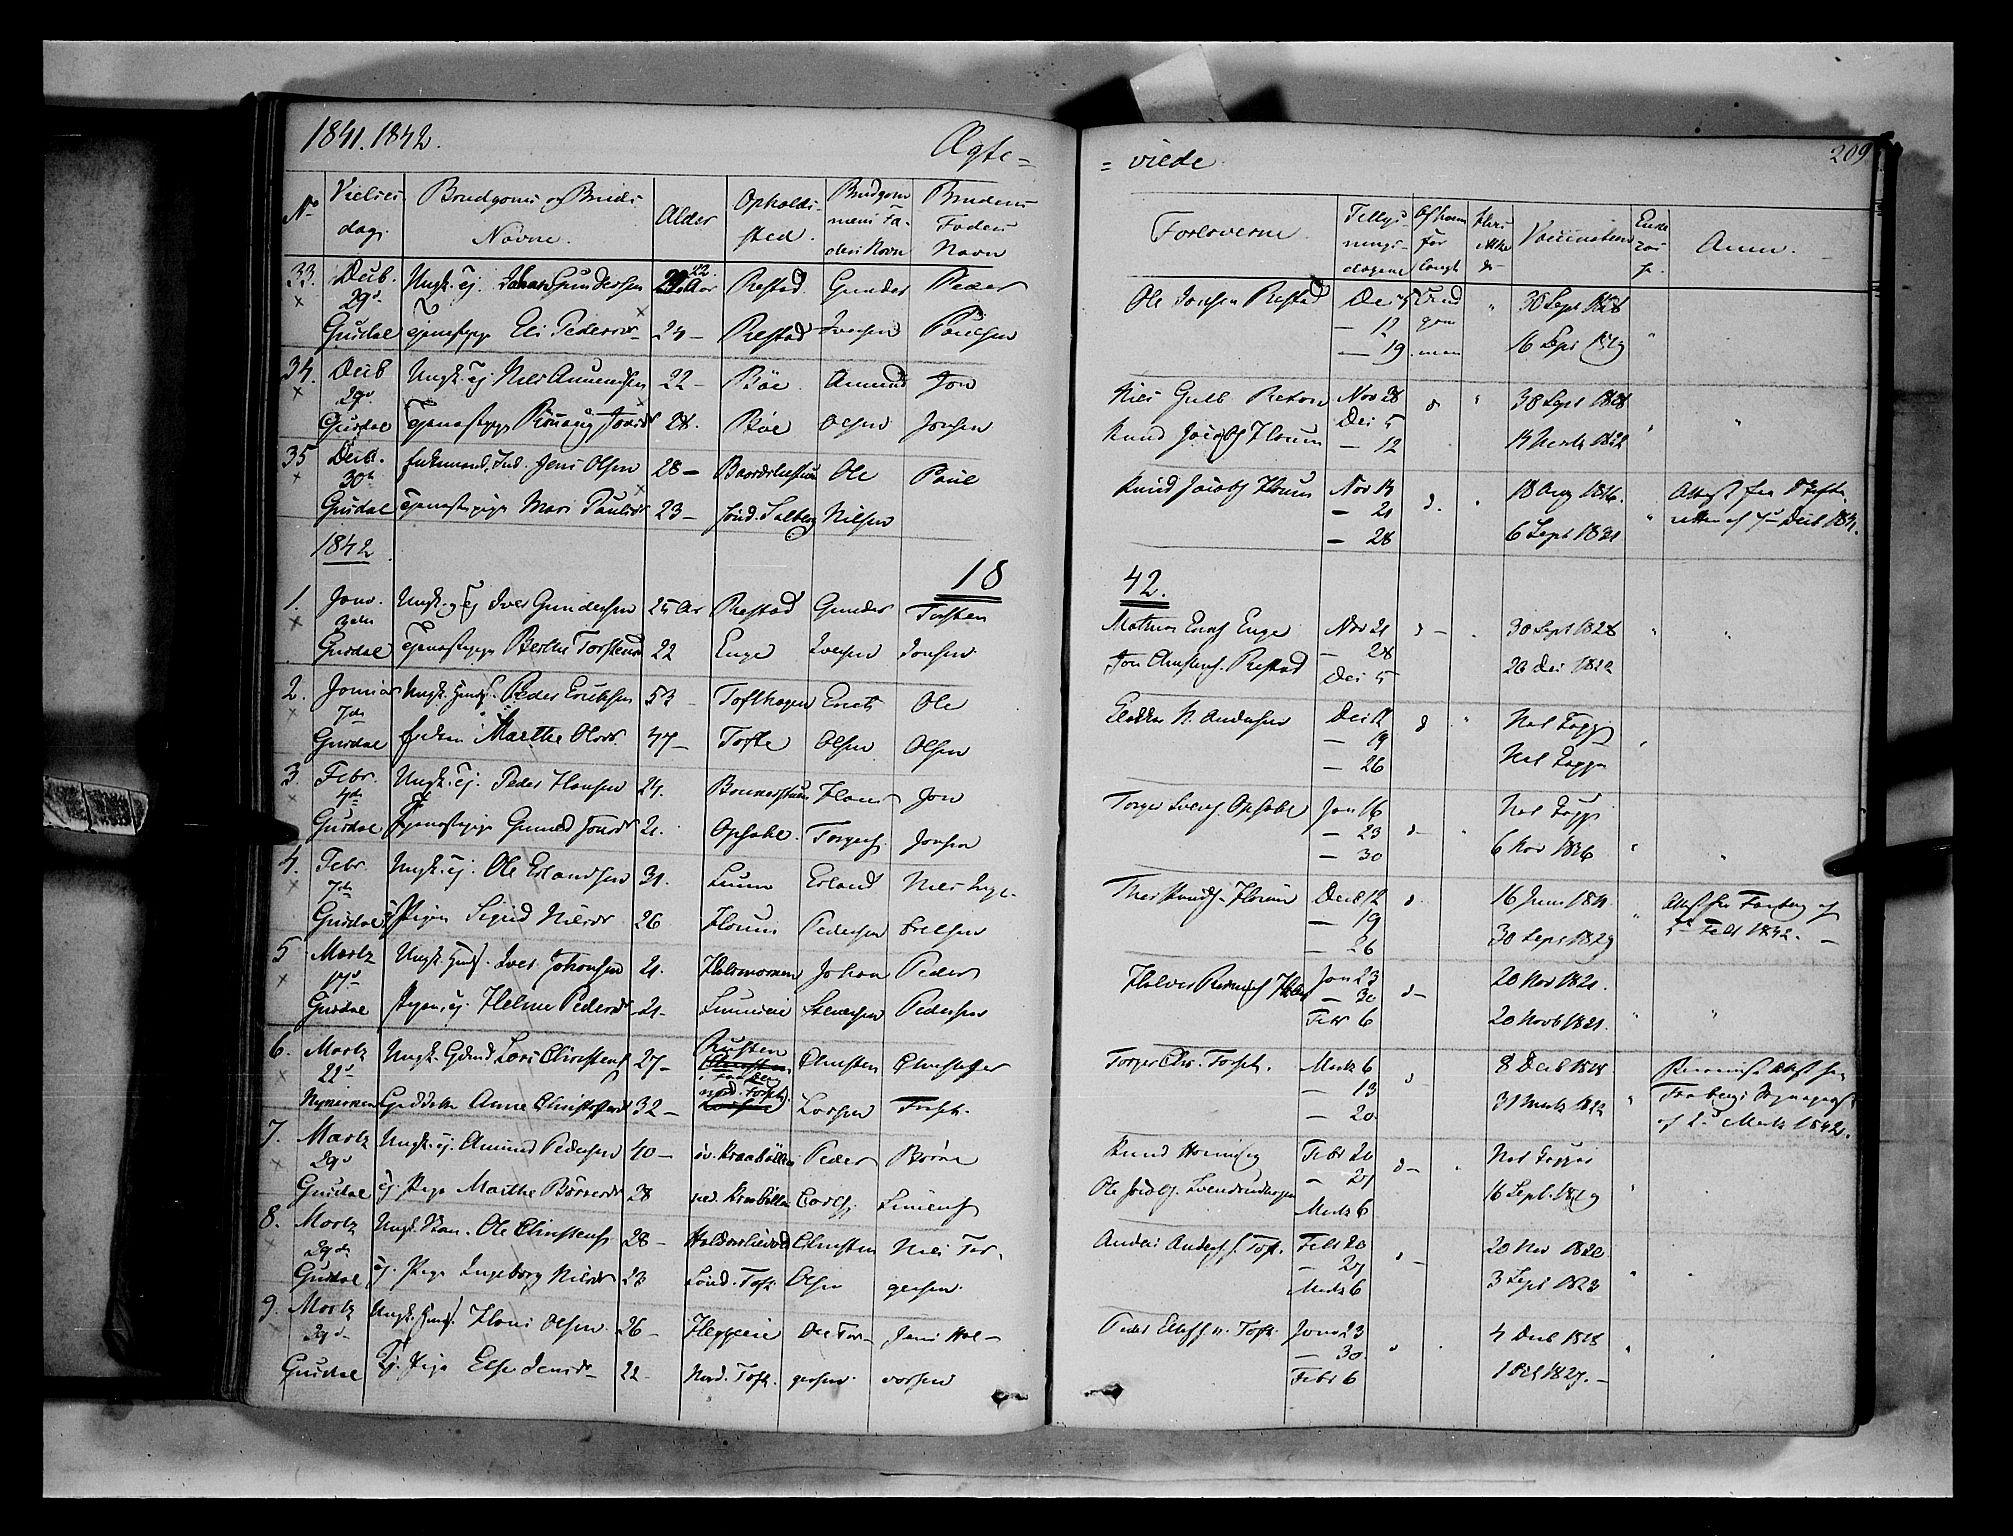 SAH, Gausdal prestekontor, Ministerialbok nr. 7, 1840-1850, s. 209